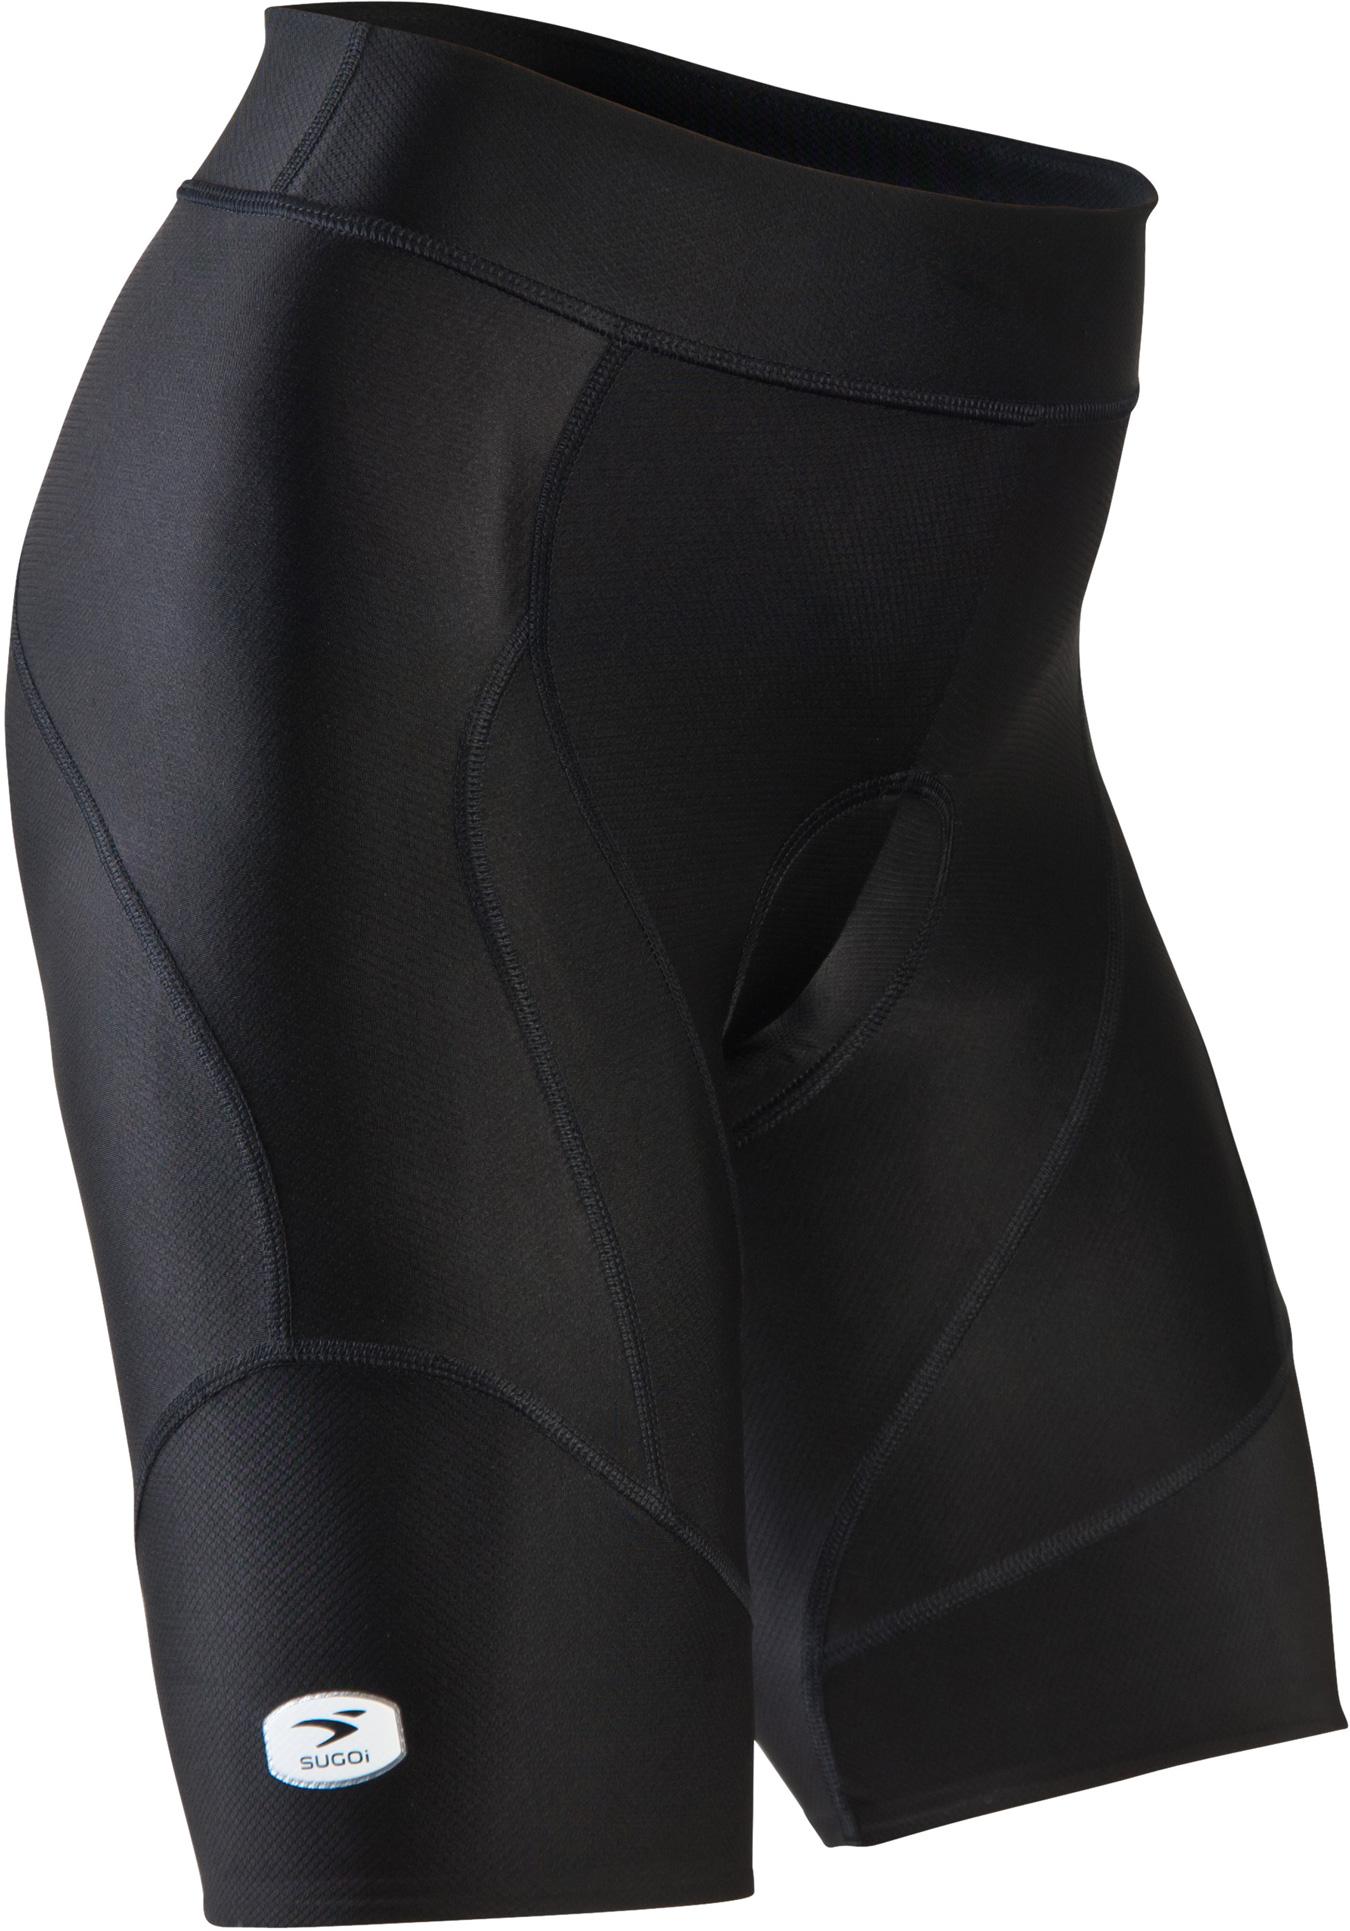 Sugoi Rs Pro Shorts Women S Calgary Amp Okotoks Bike Shop